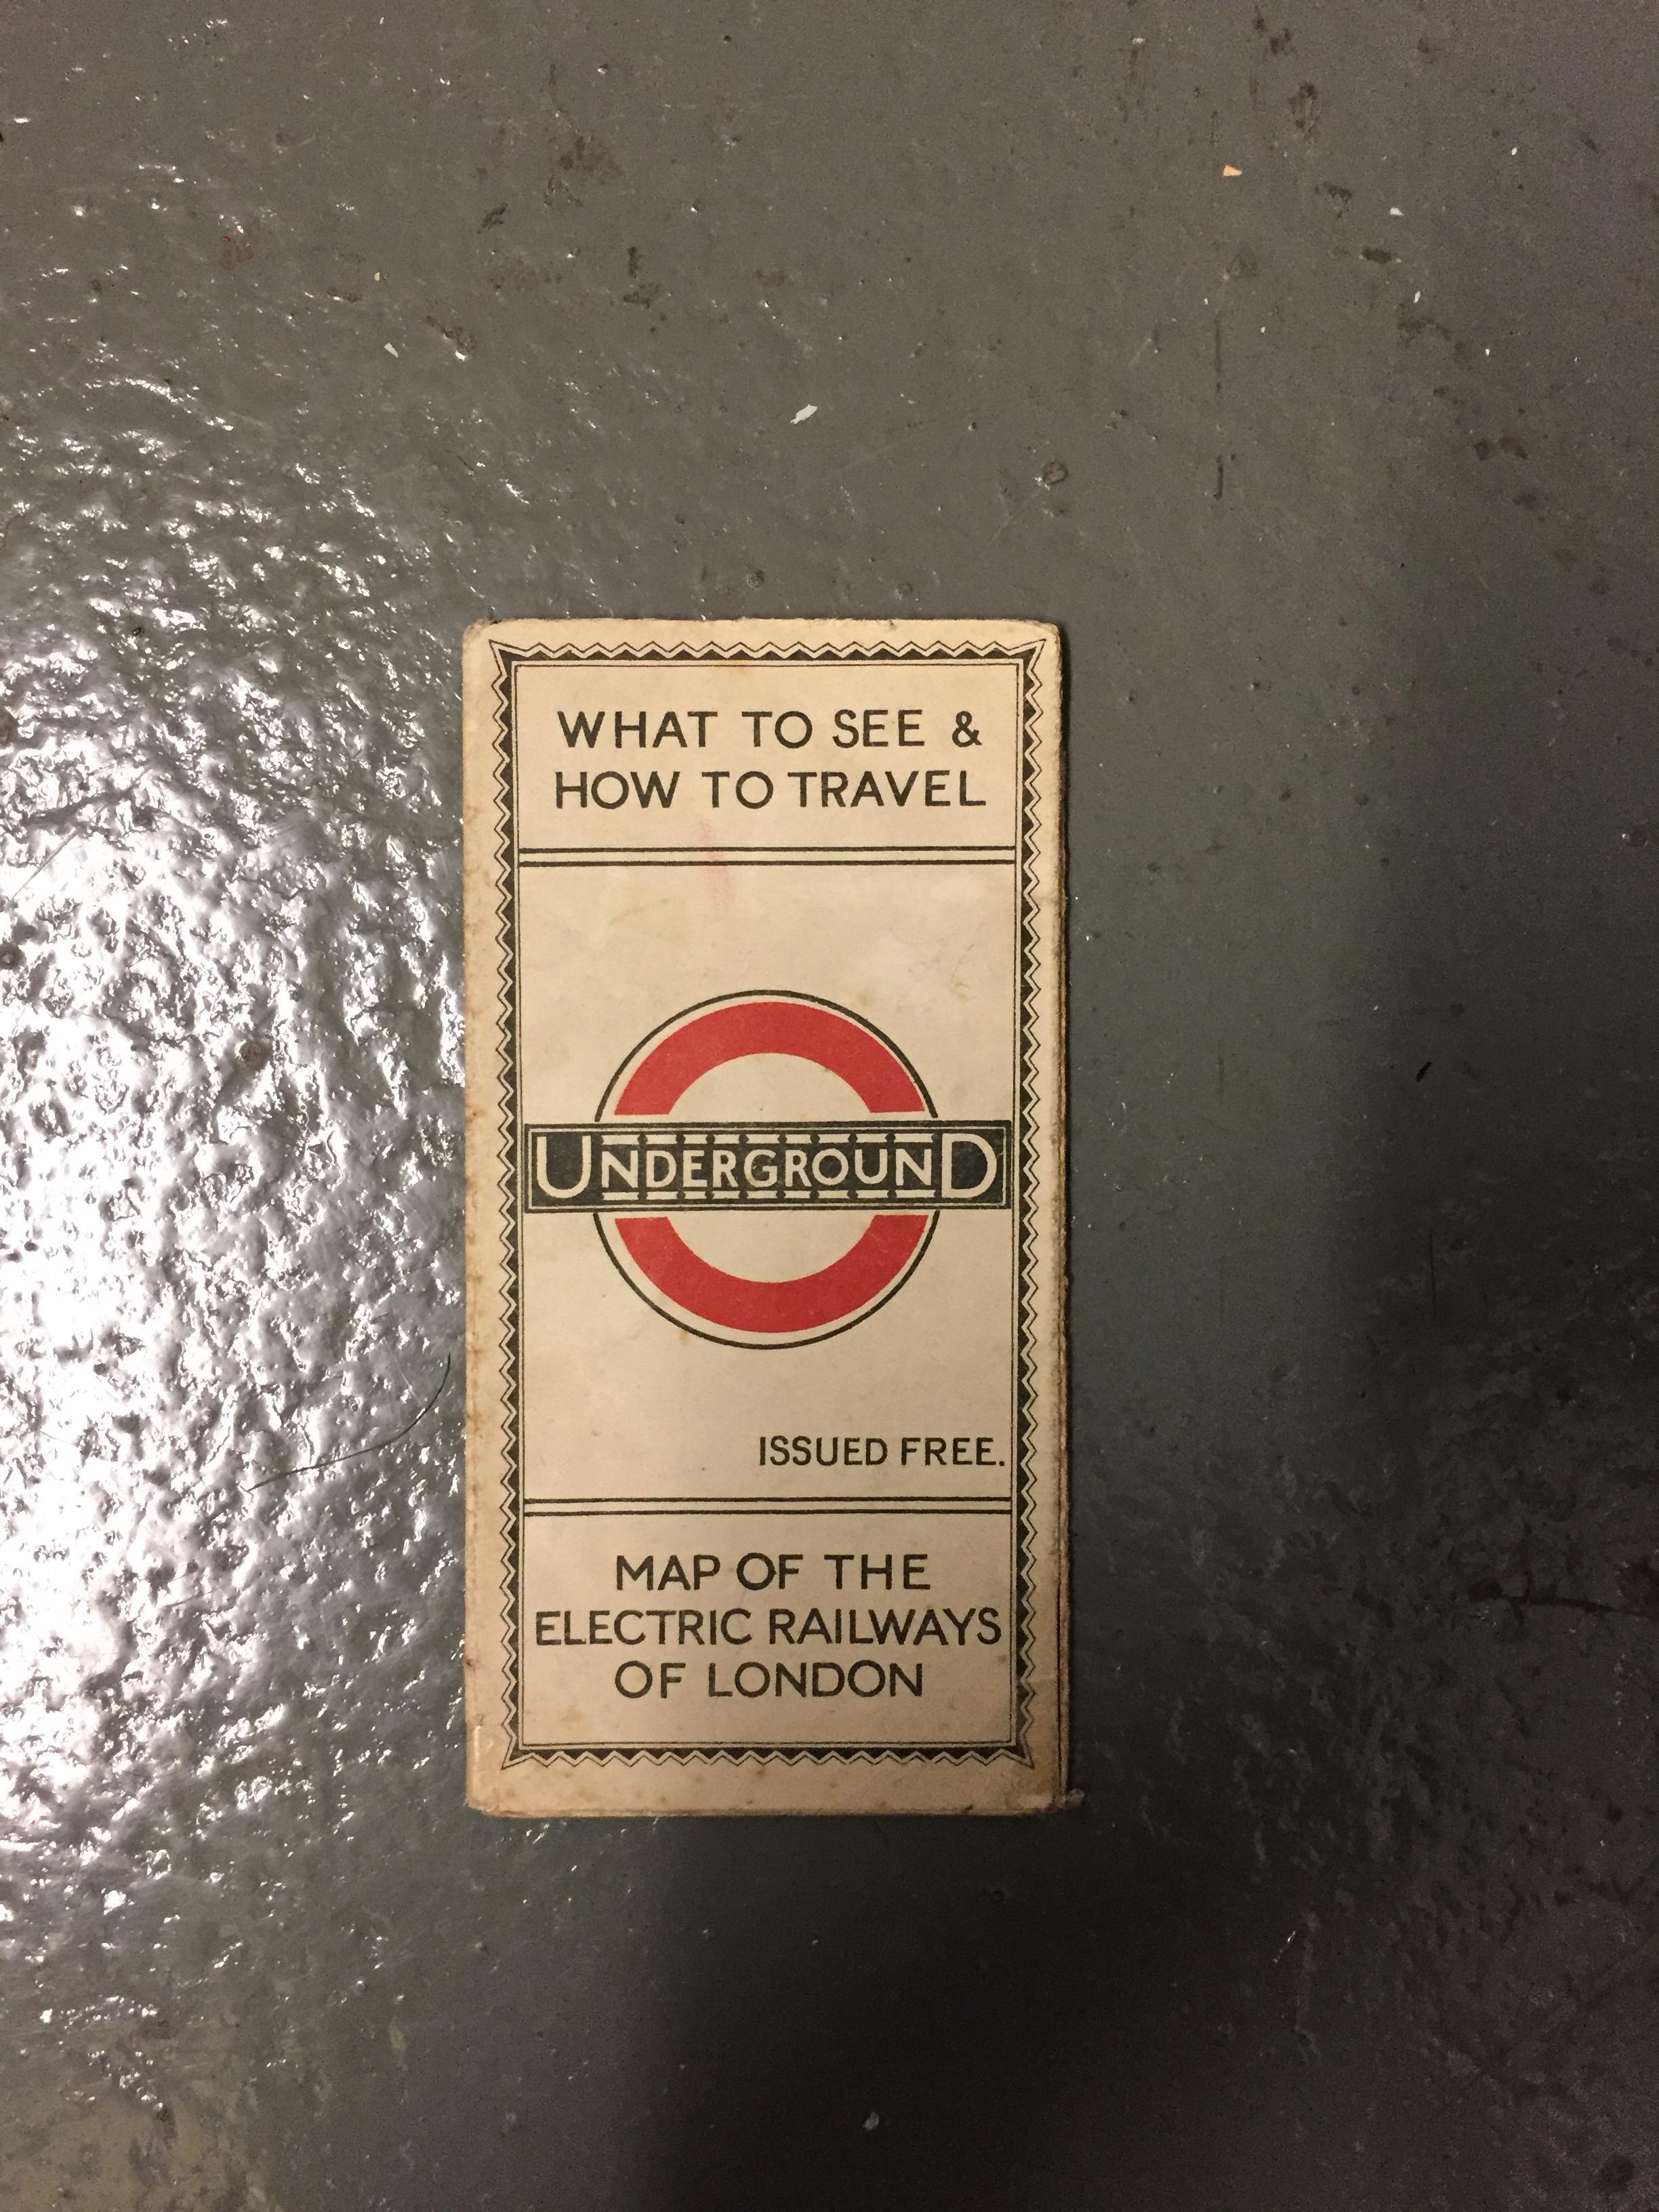 Nine 1910/20s folding pocket maps for London transport,comprising a 1916 General Omnibus Map of some - Image 10 of 15